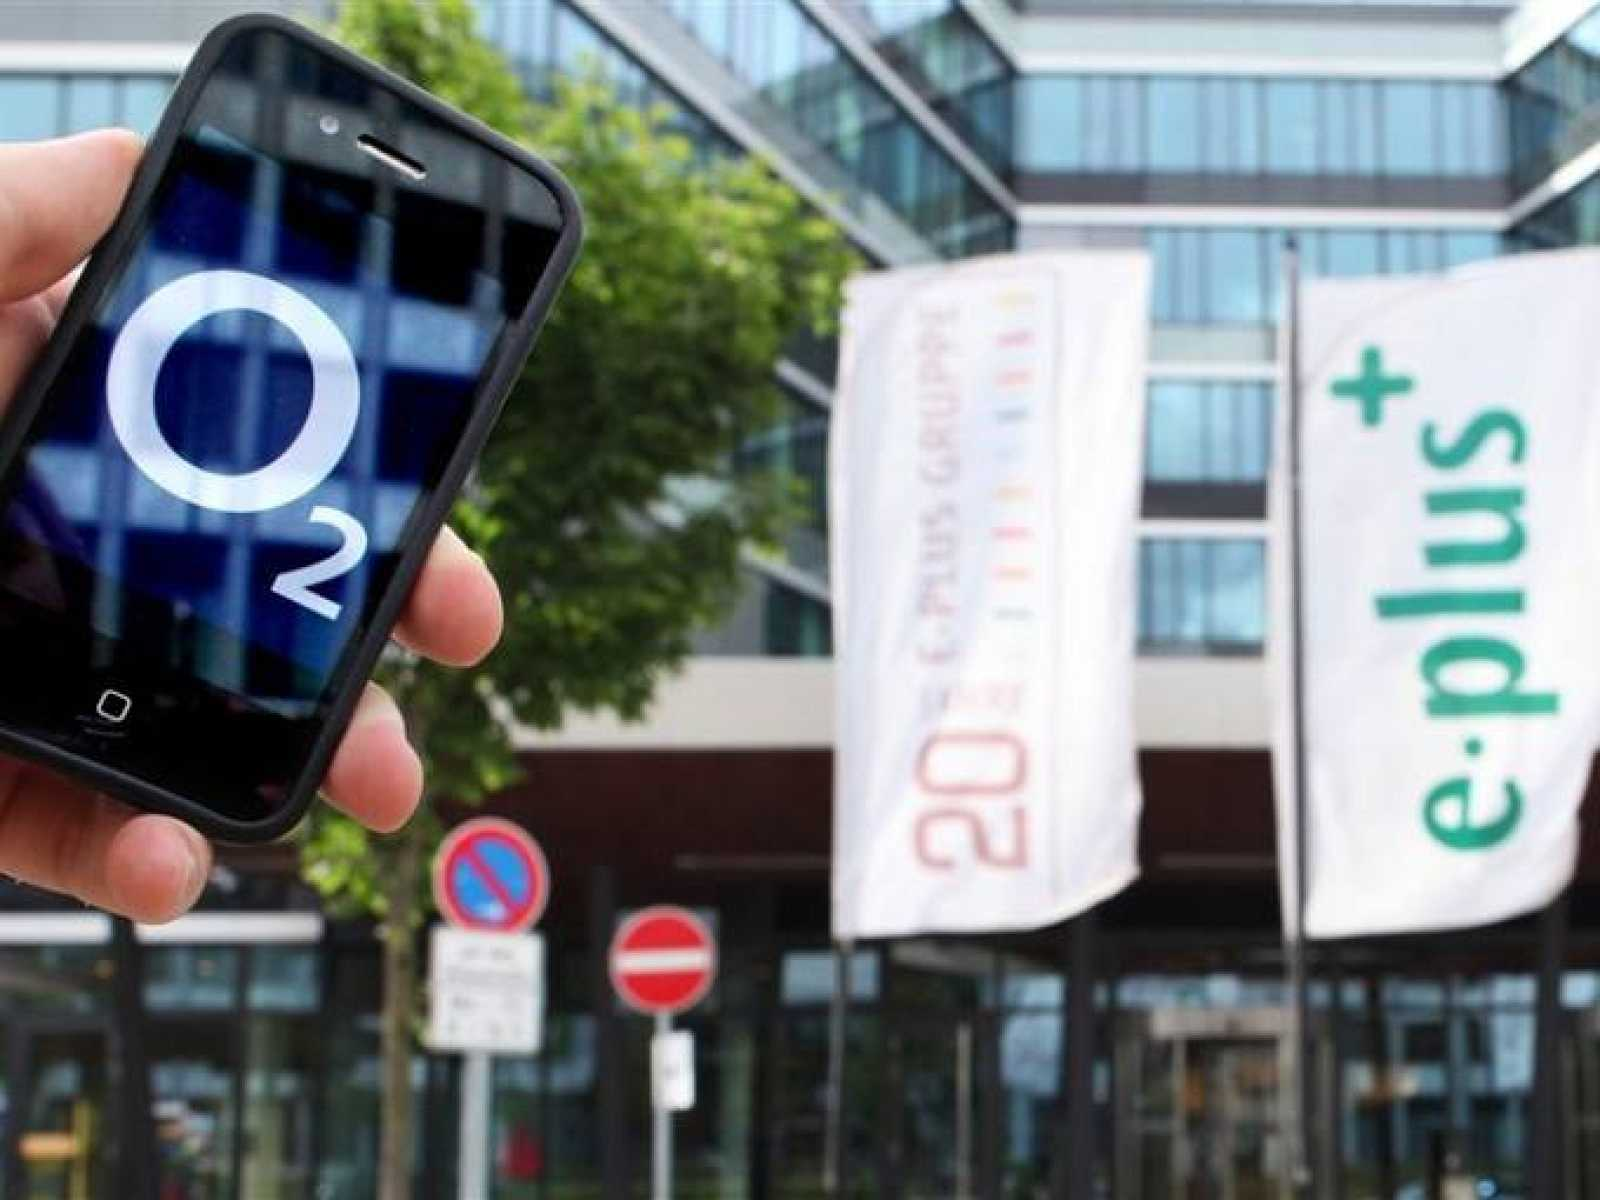 Telefónica, autorizada a comprar la operadora de móviles alemana E-Plus